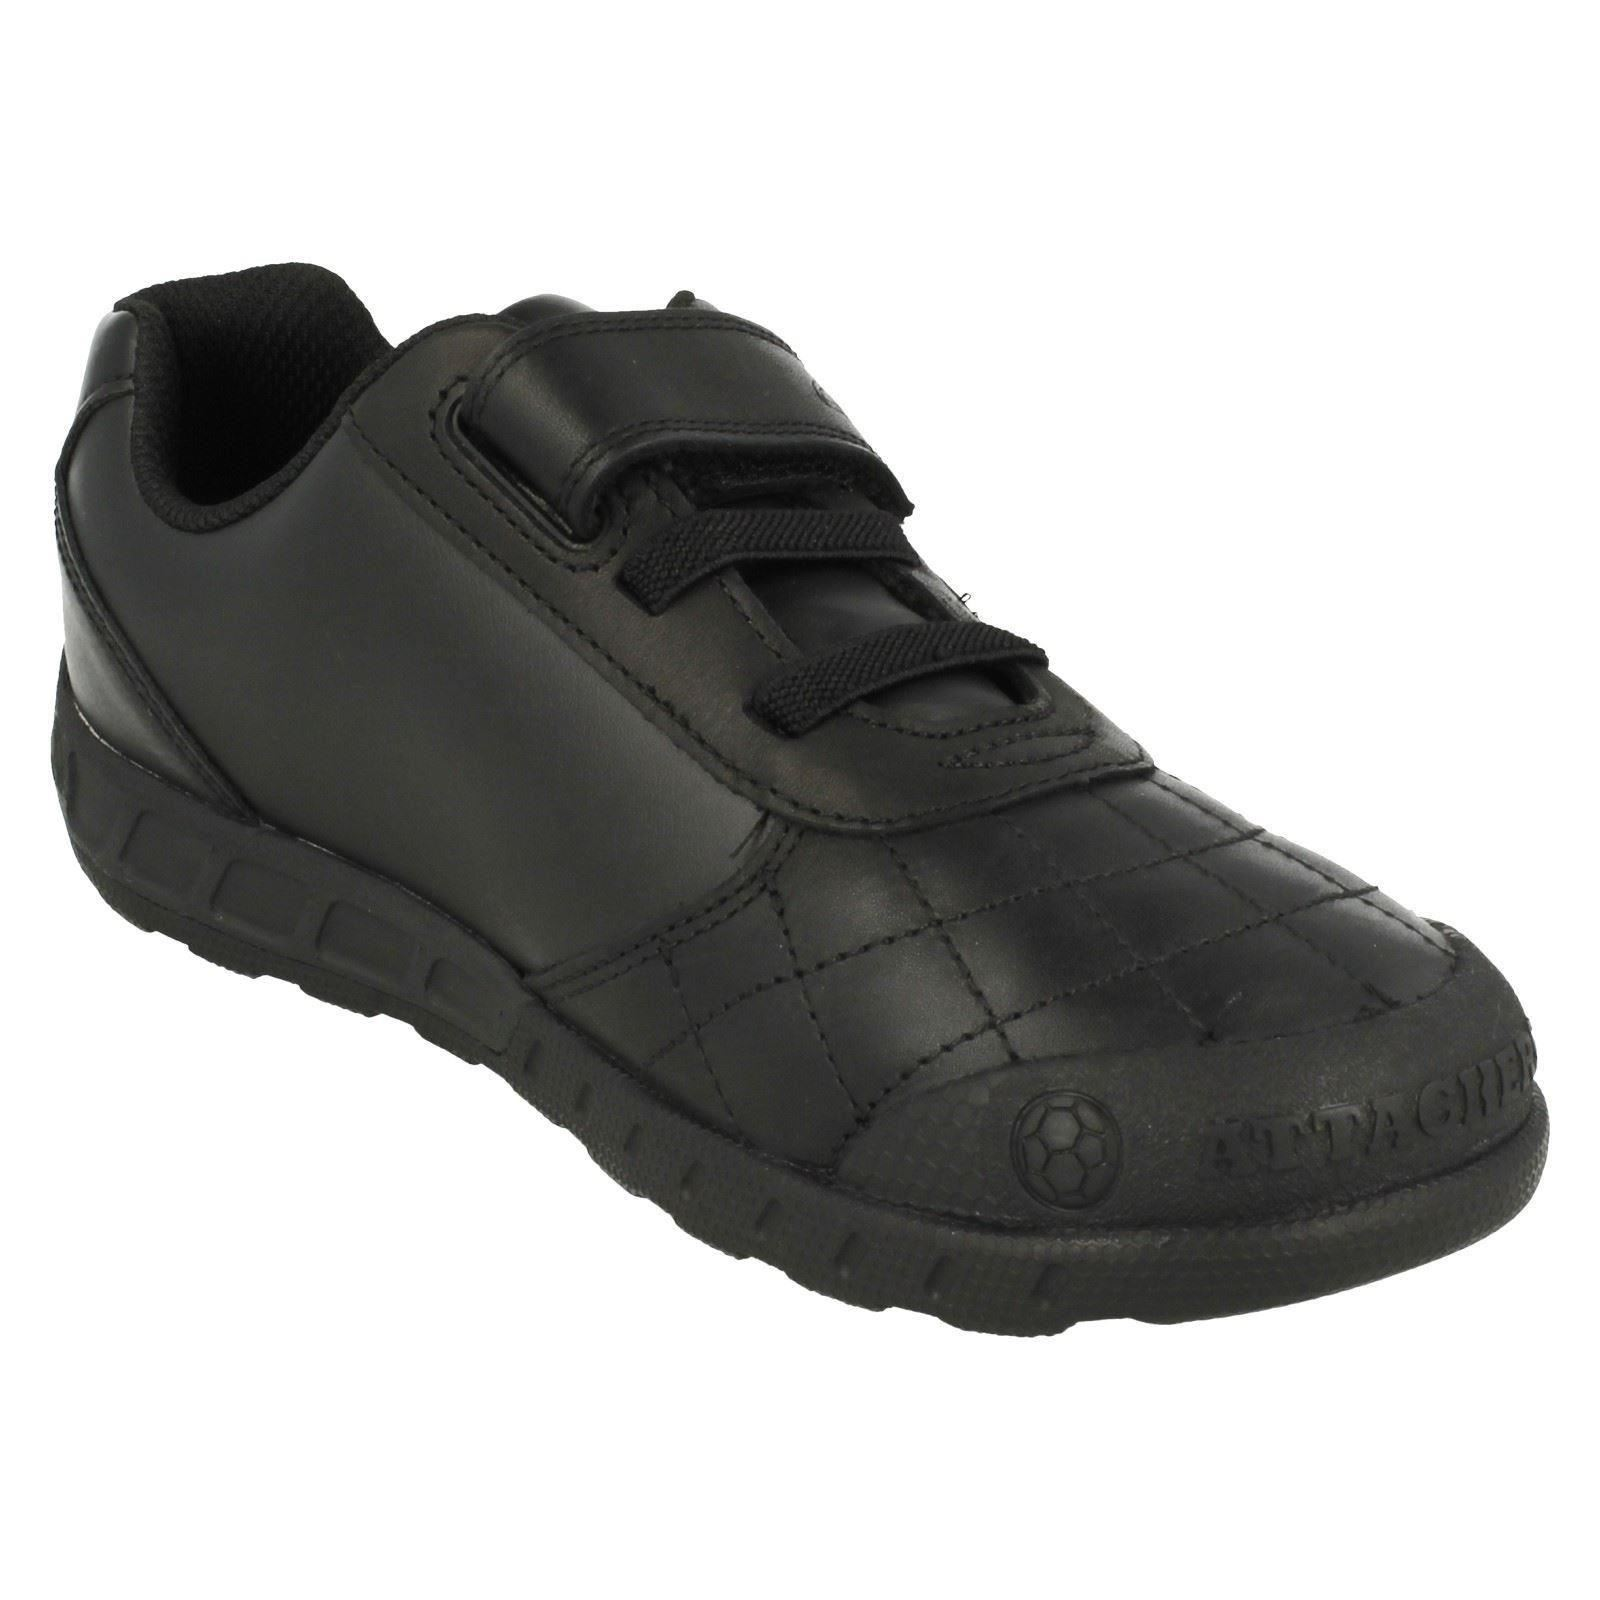 Boys Clarks Leader Game Football Design School Shoes